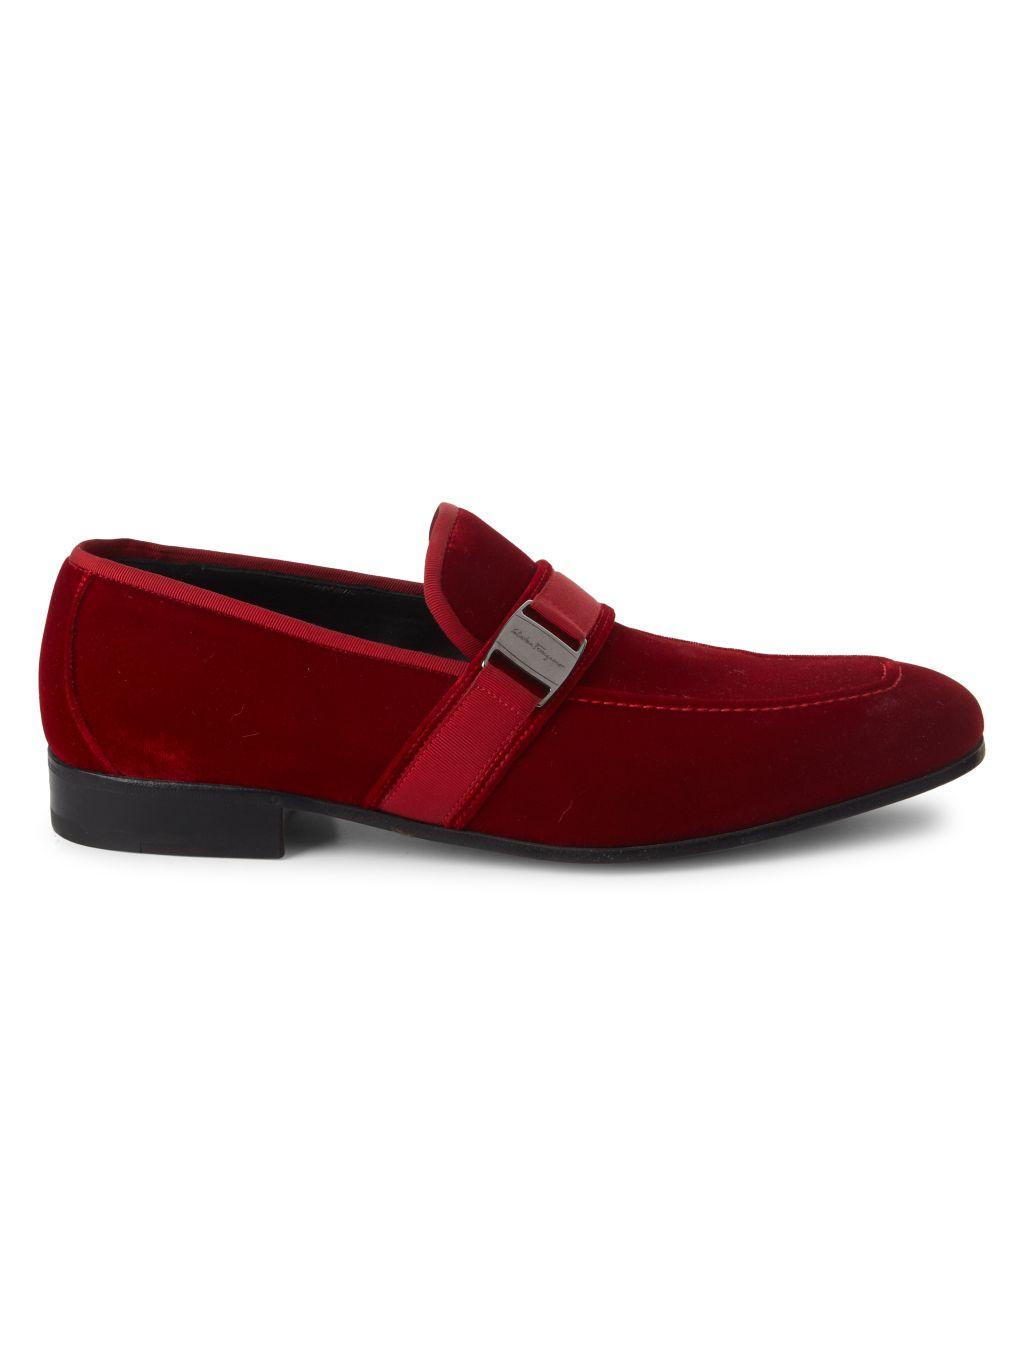 Salvatore Ferragamo Danny Velvet Loafers